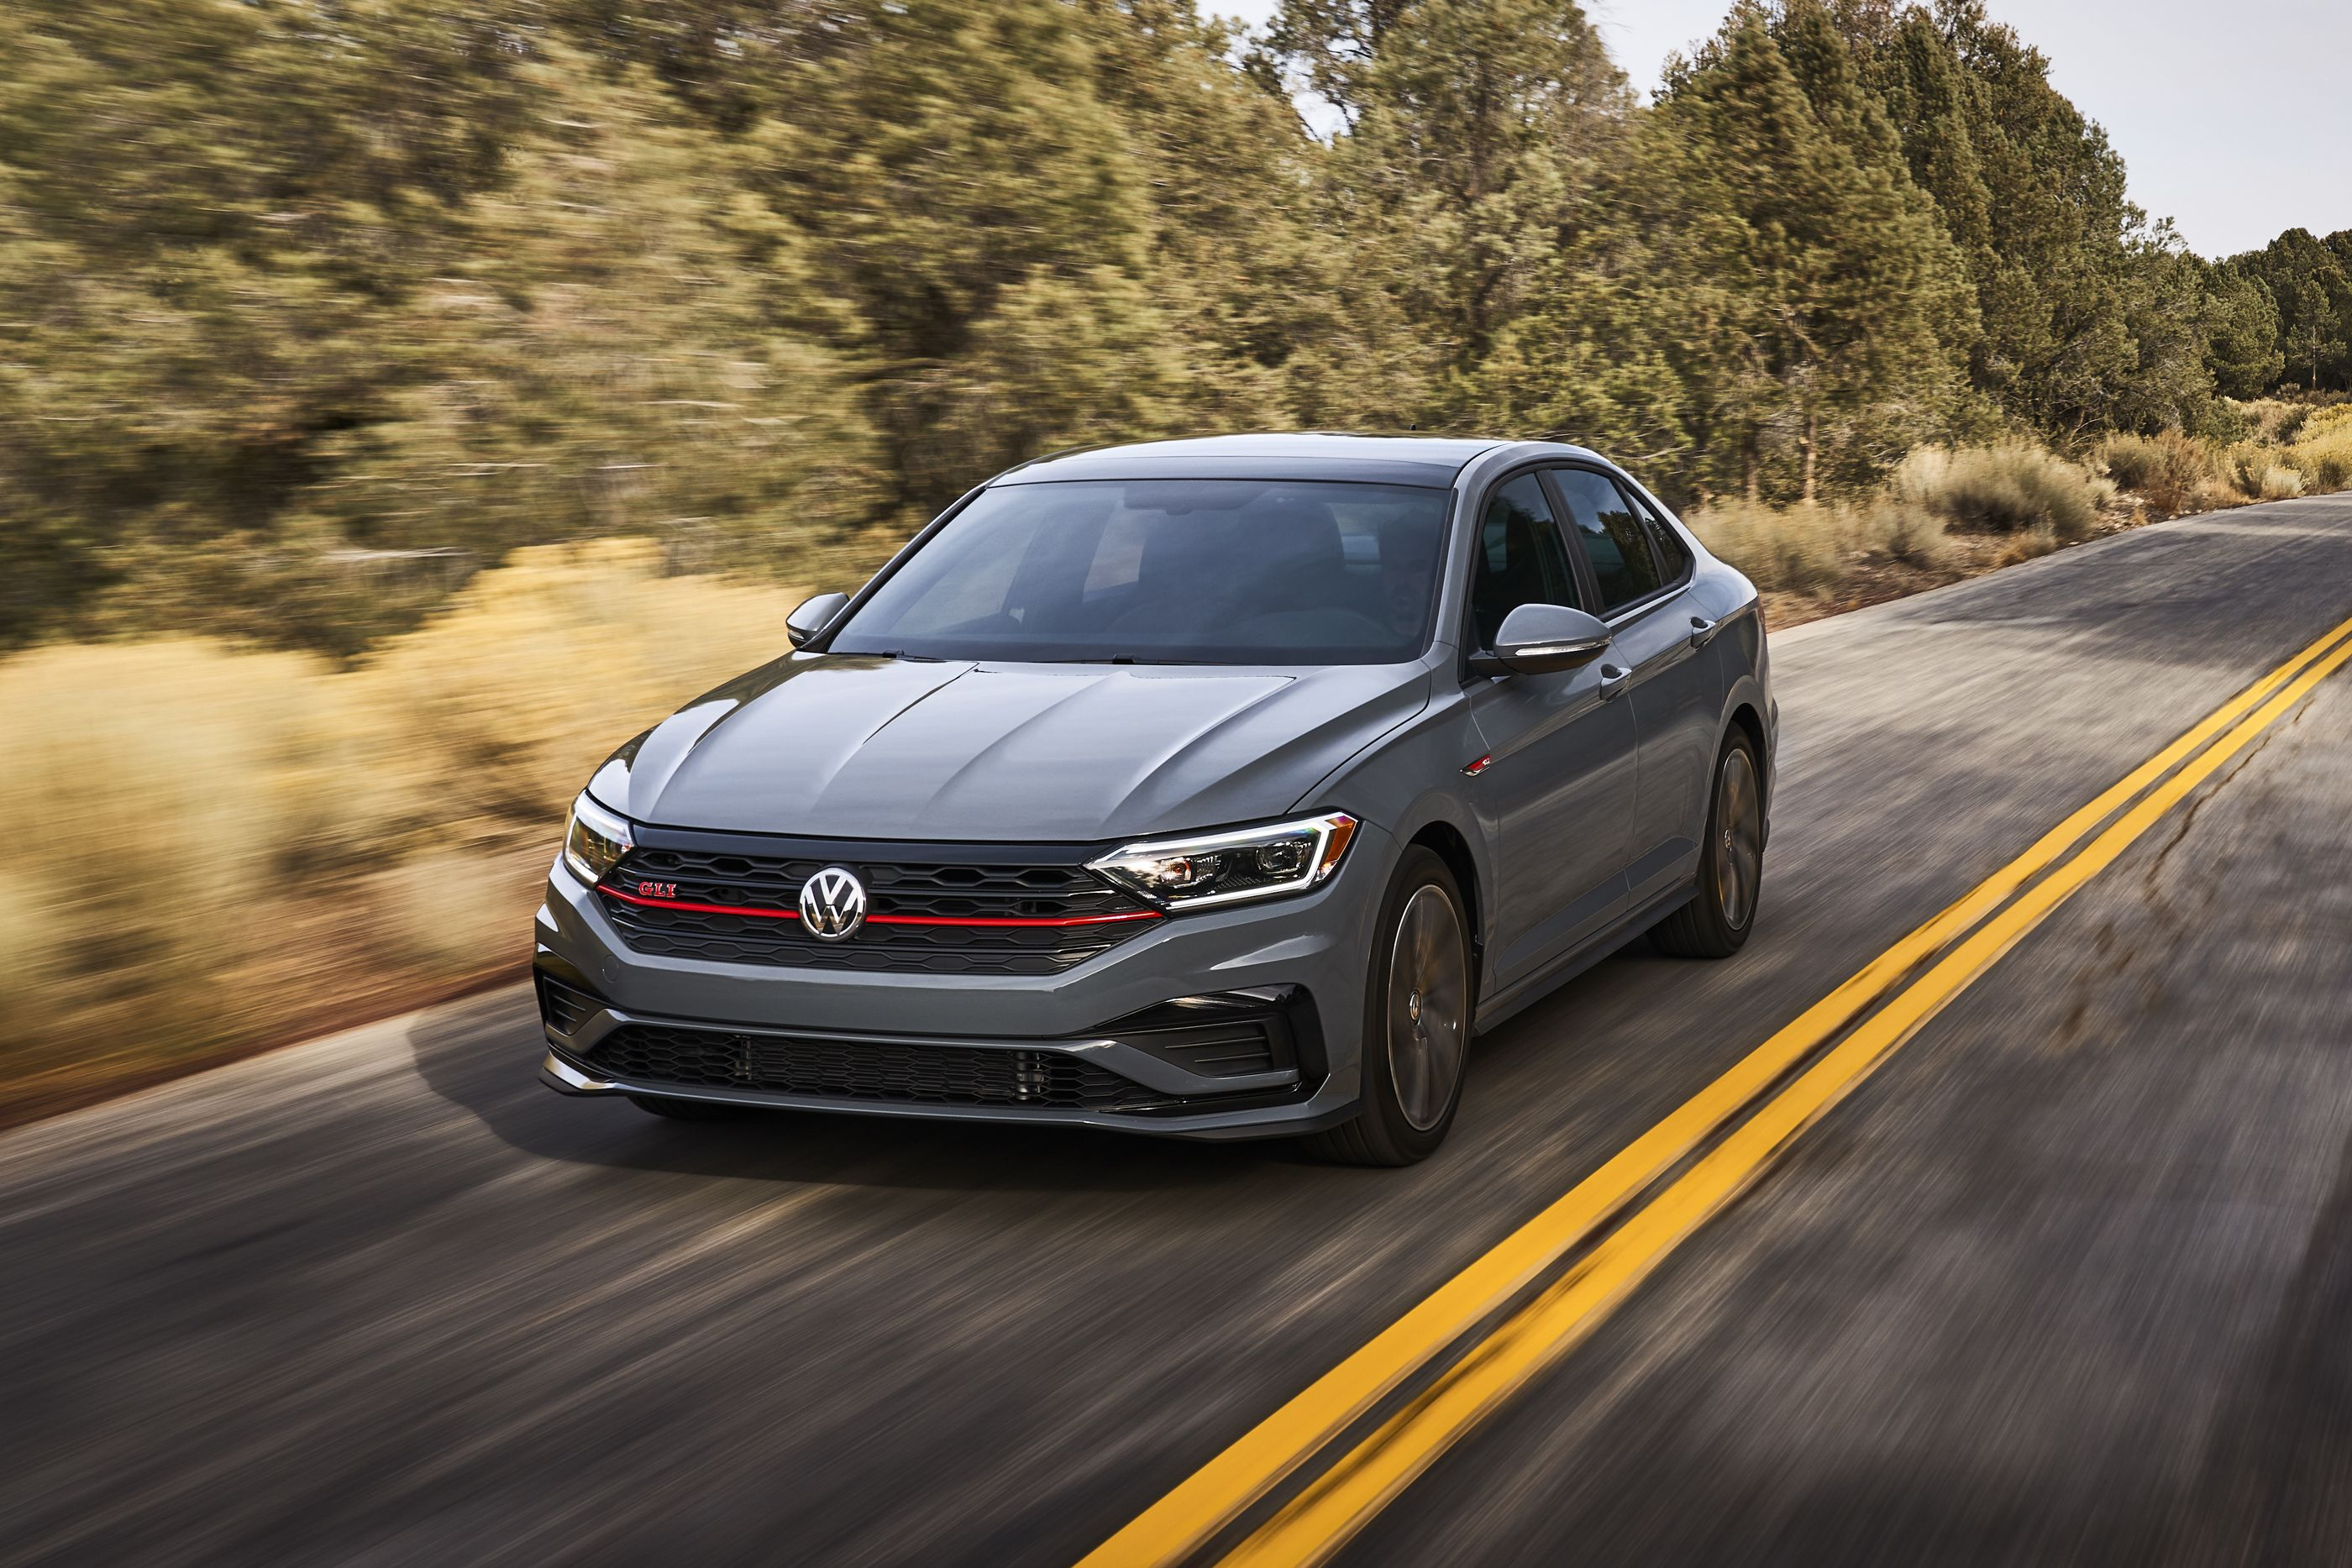 2021 Volkswagen Jetta Gli Review Pricing And Specs